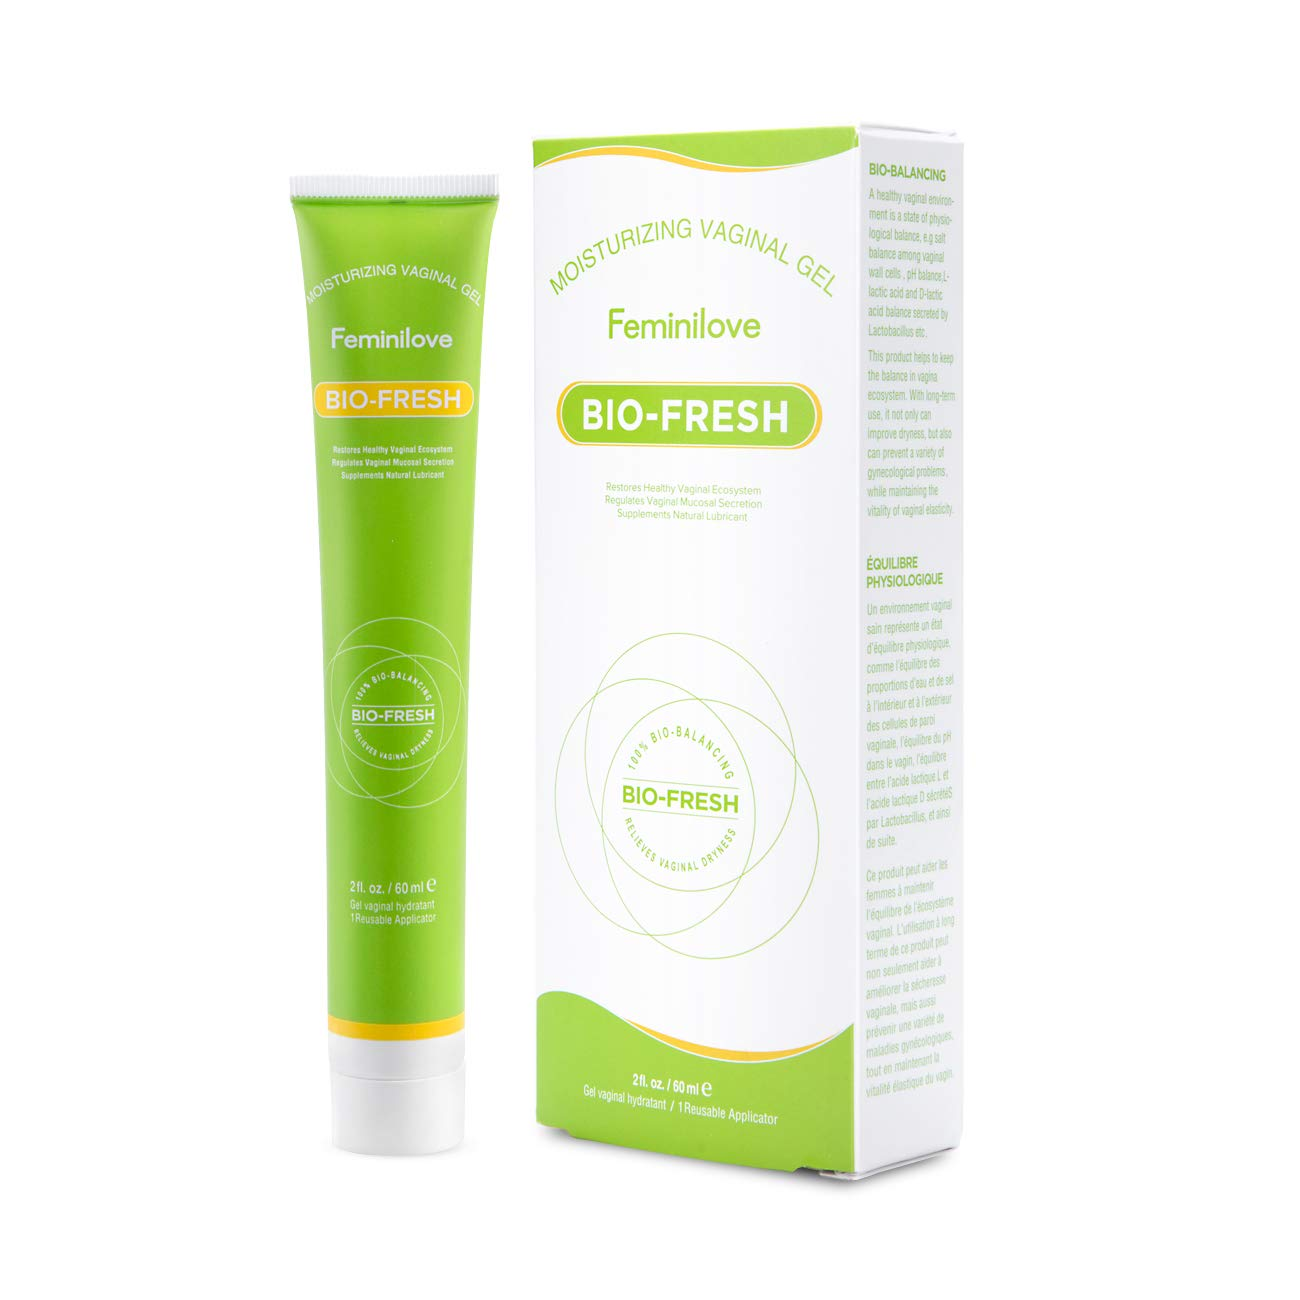 Feminilove Organic Moisturizing Certified Vaginal 通信販売 Gel 海外